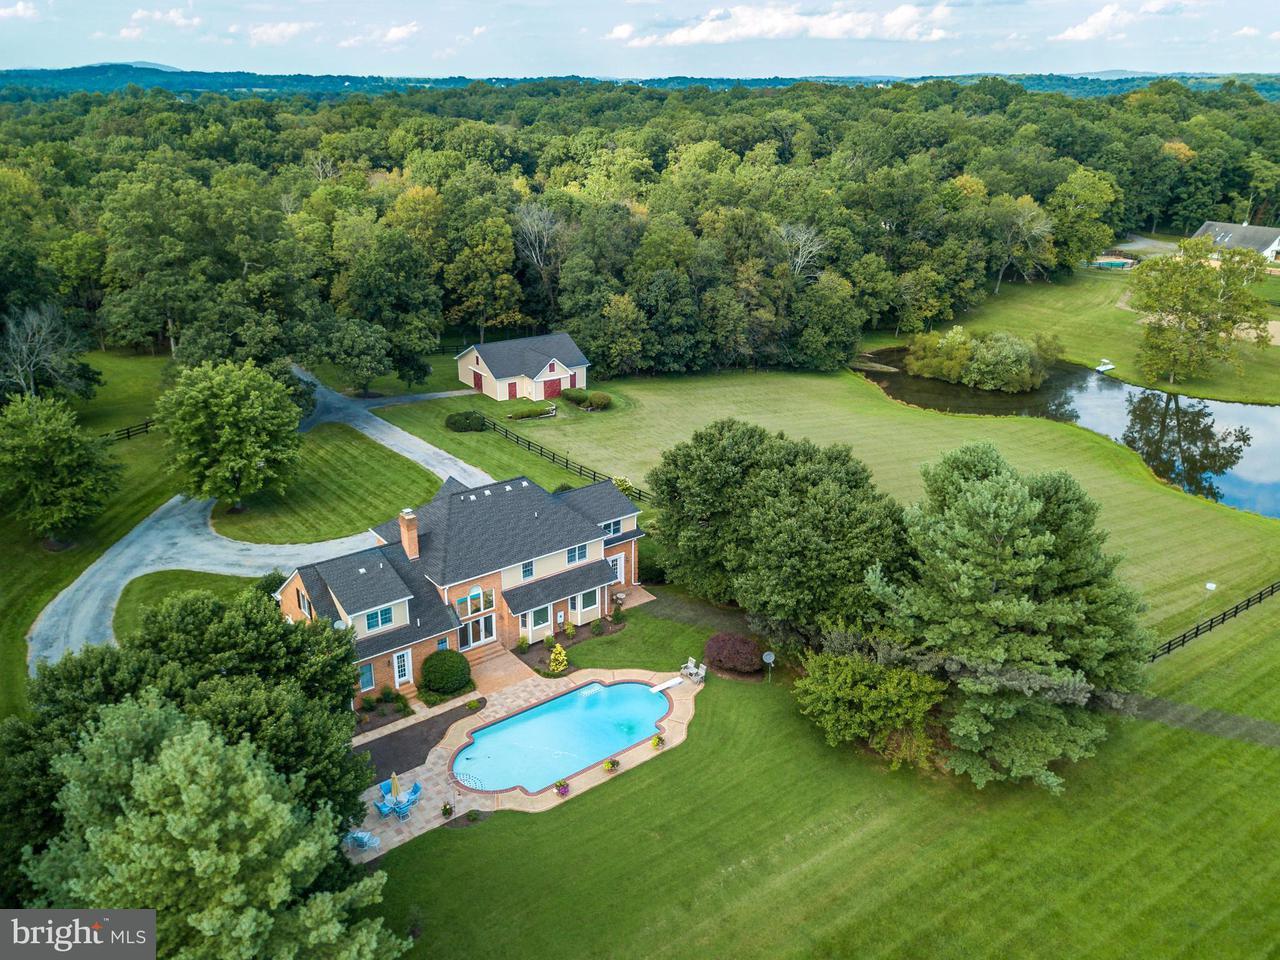 獨棟家庭住宅 為 出售 在 20082 UNISON Road 20082 UNISON Road Purcellville, 弗吉尼亞州 20132 美國